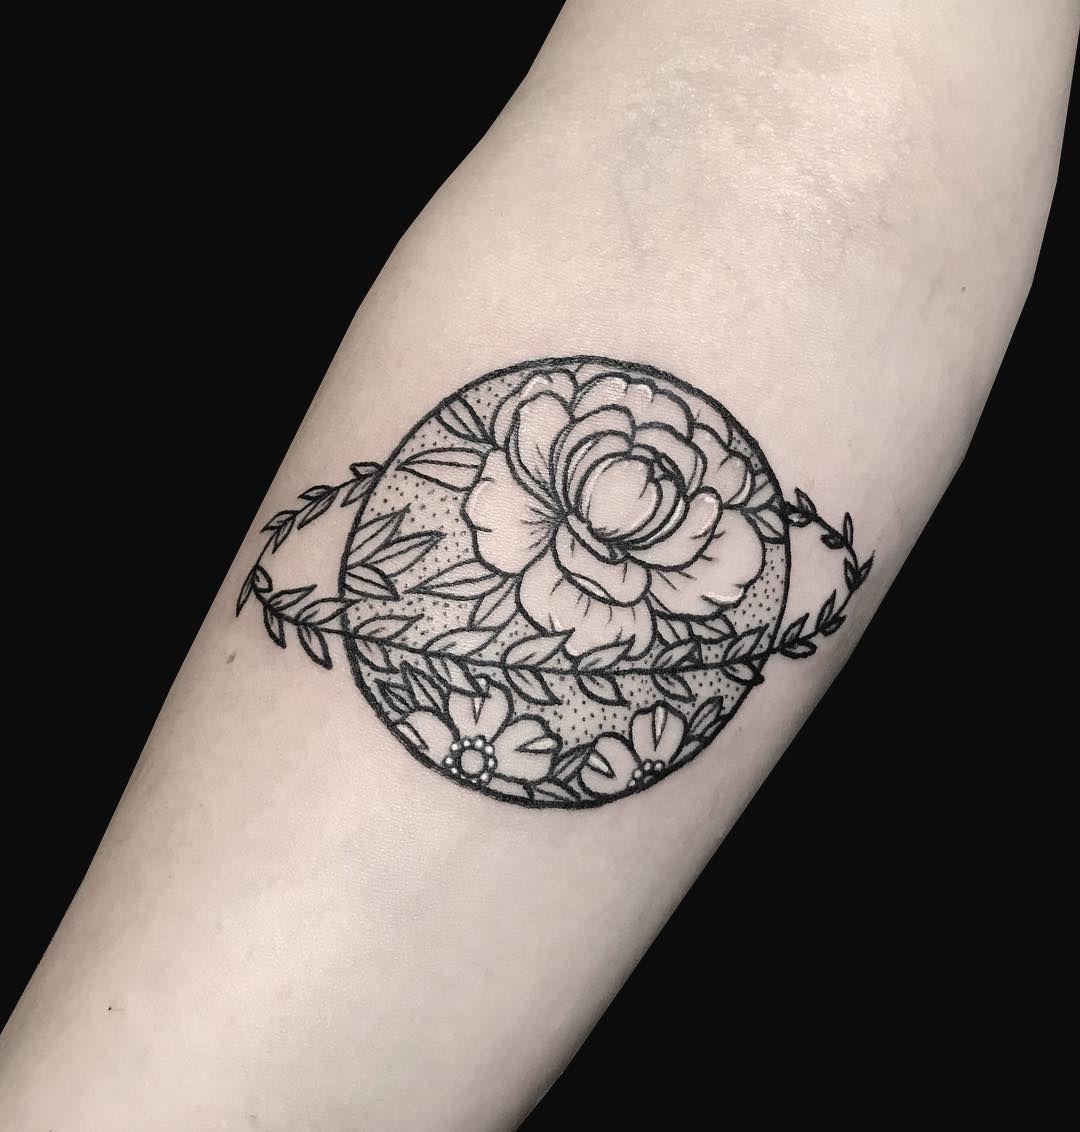 The Monumental Ink Tattoo Artists Tattoos,